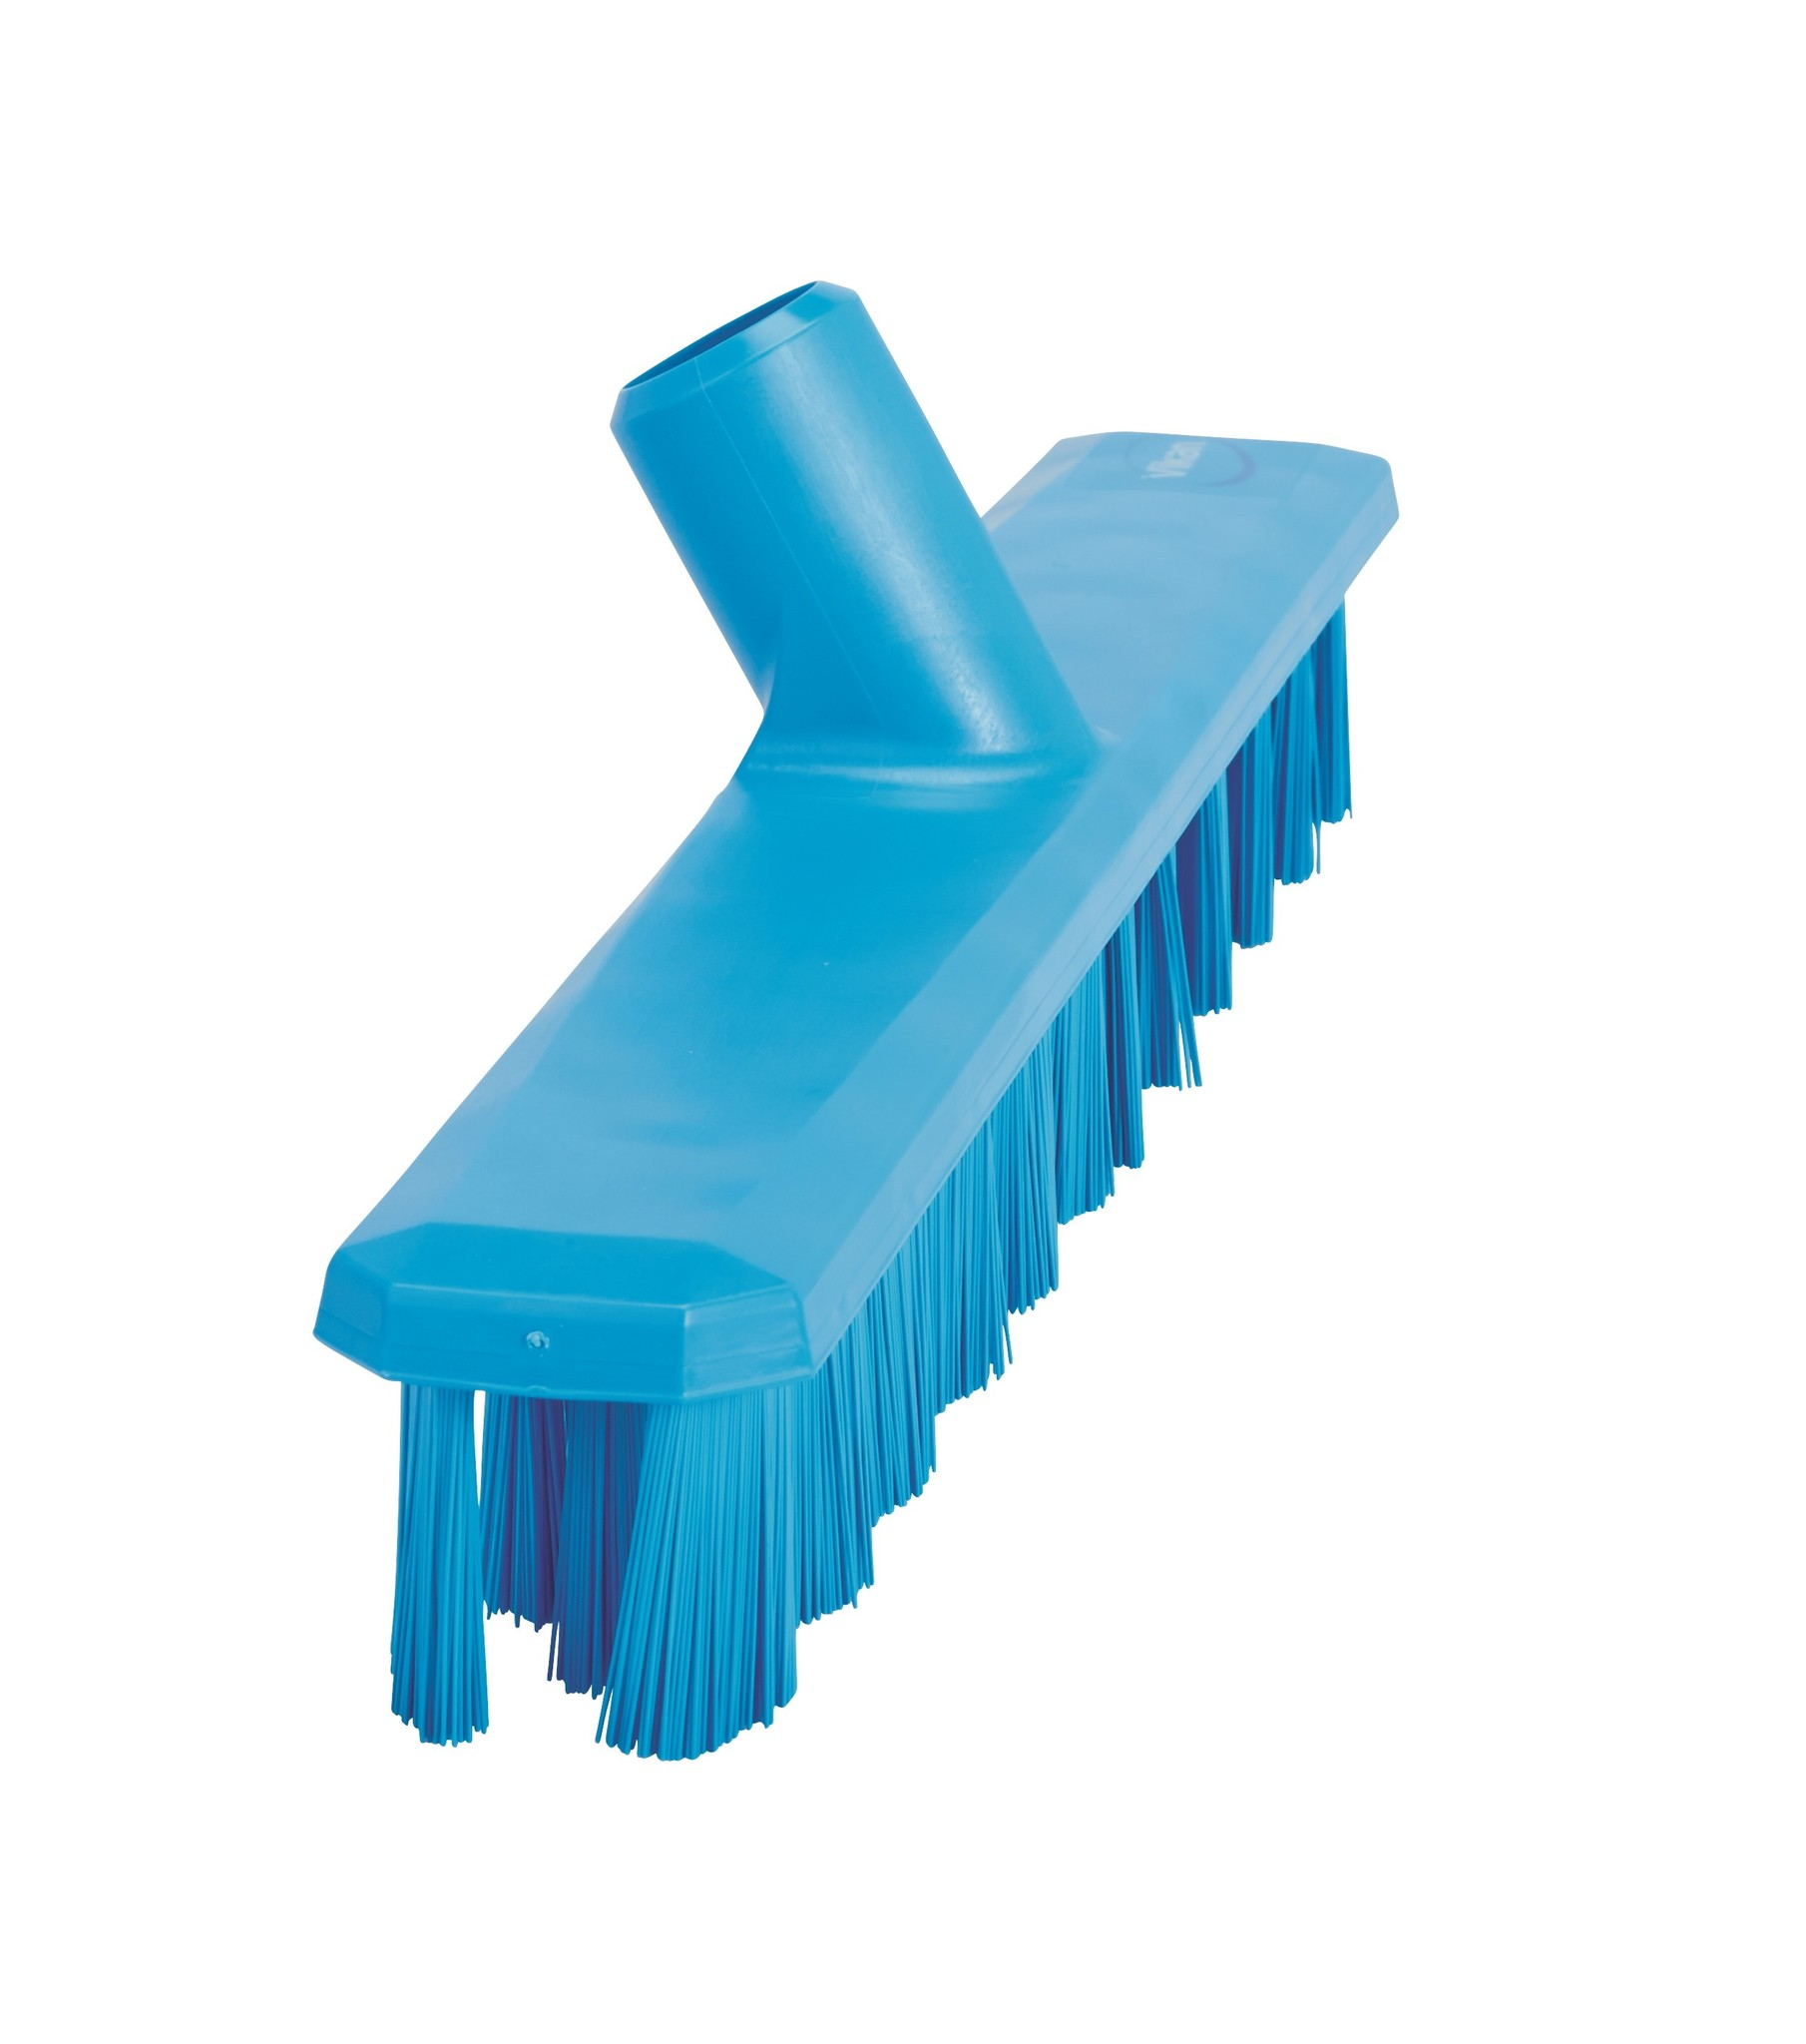 Vikan Vikan vloerschrobber, blauw